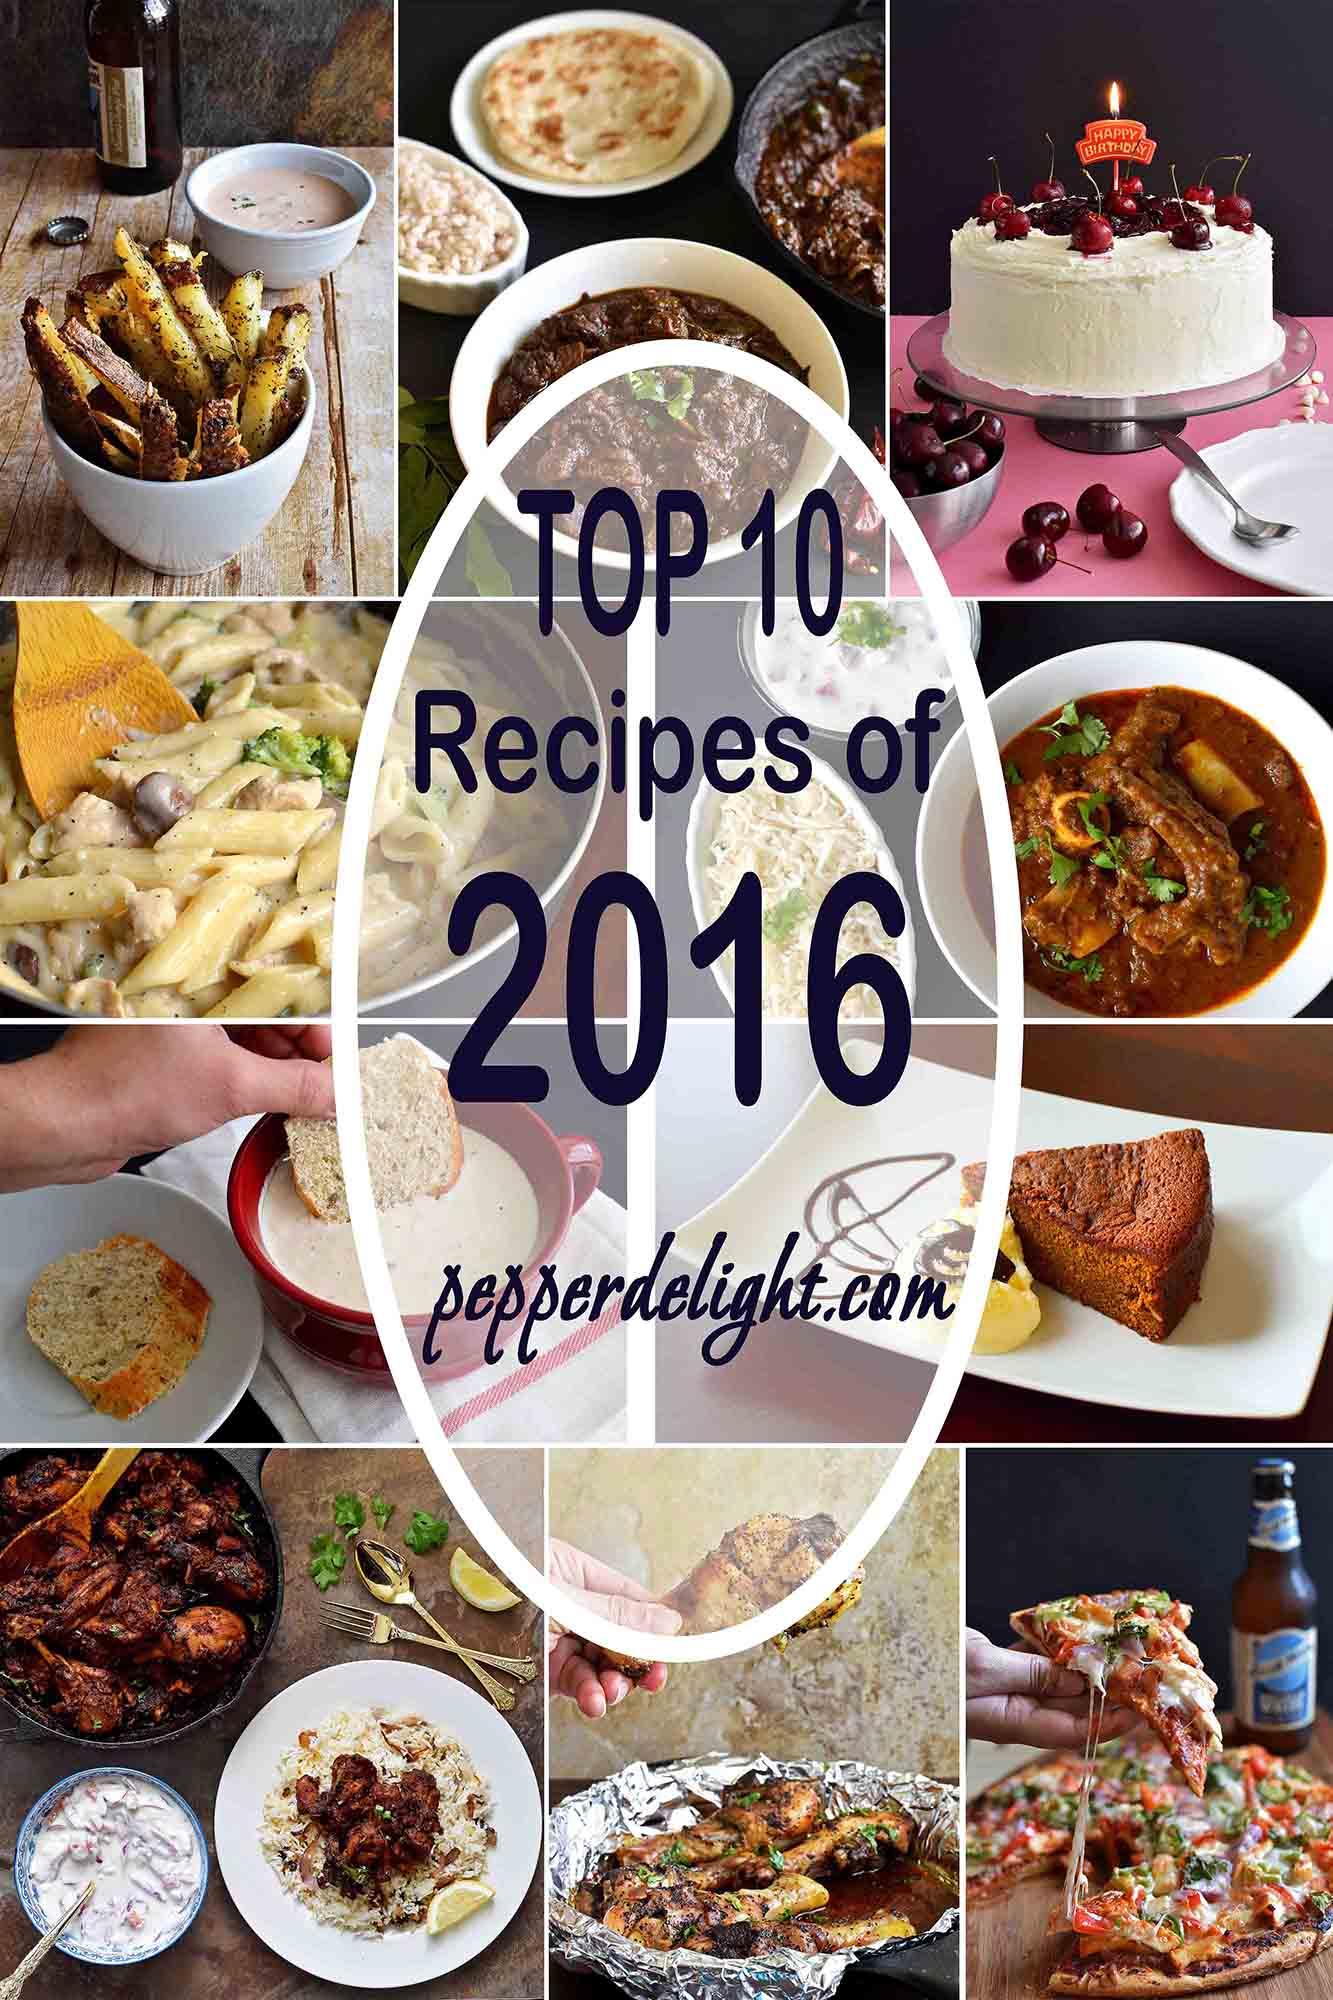 Top 10 recipes of 2016 - Pepper Delight #pepperdelightblog #recipe #2016 #top10recipes #popularrecipes #newyear #readersfavorites